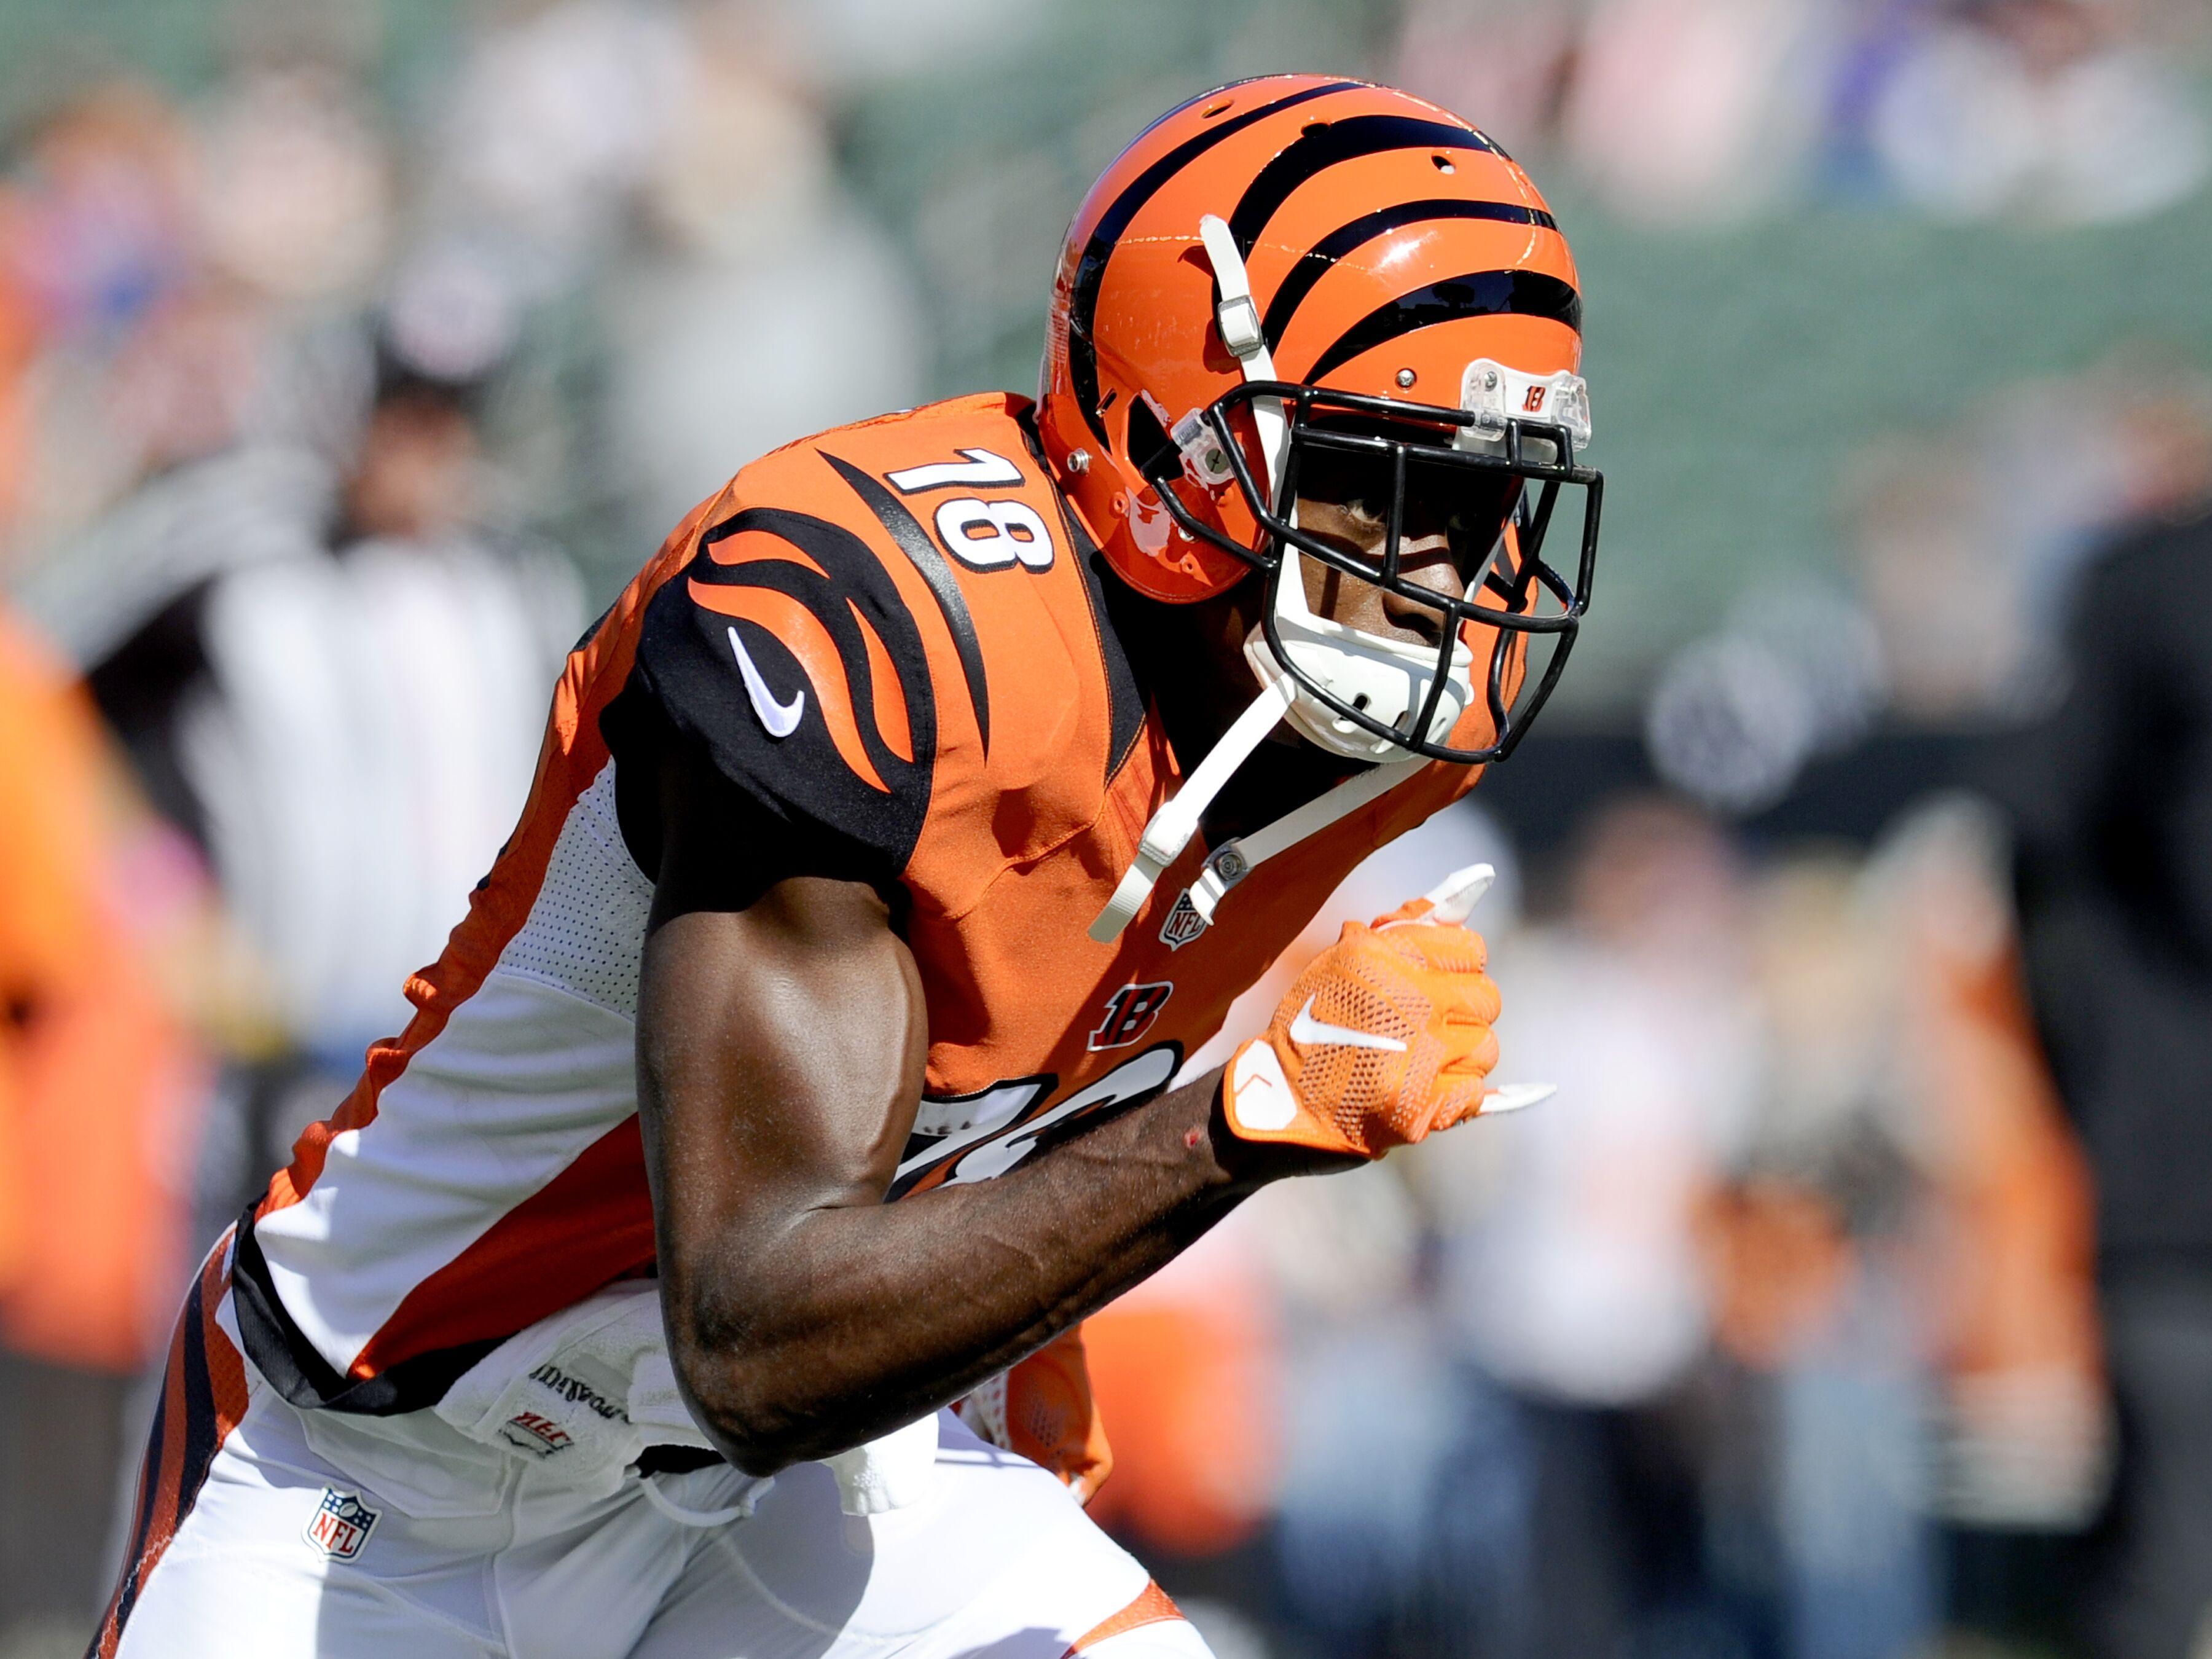 Nfl Preview 2017 Cincinnati Bengals